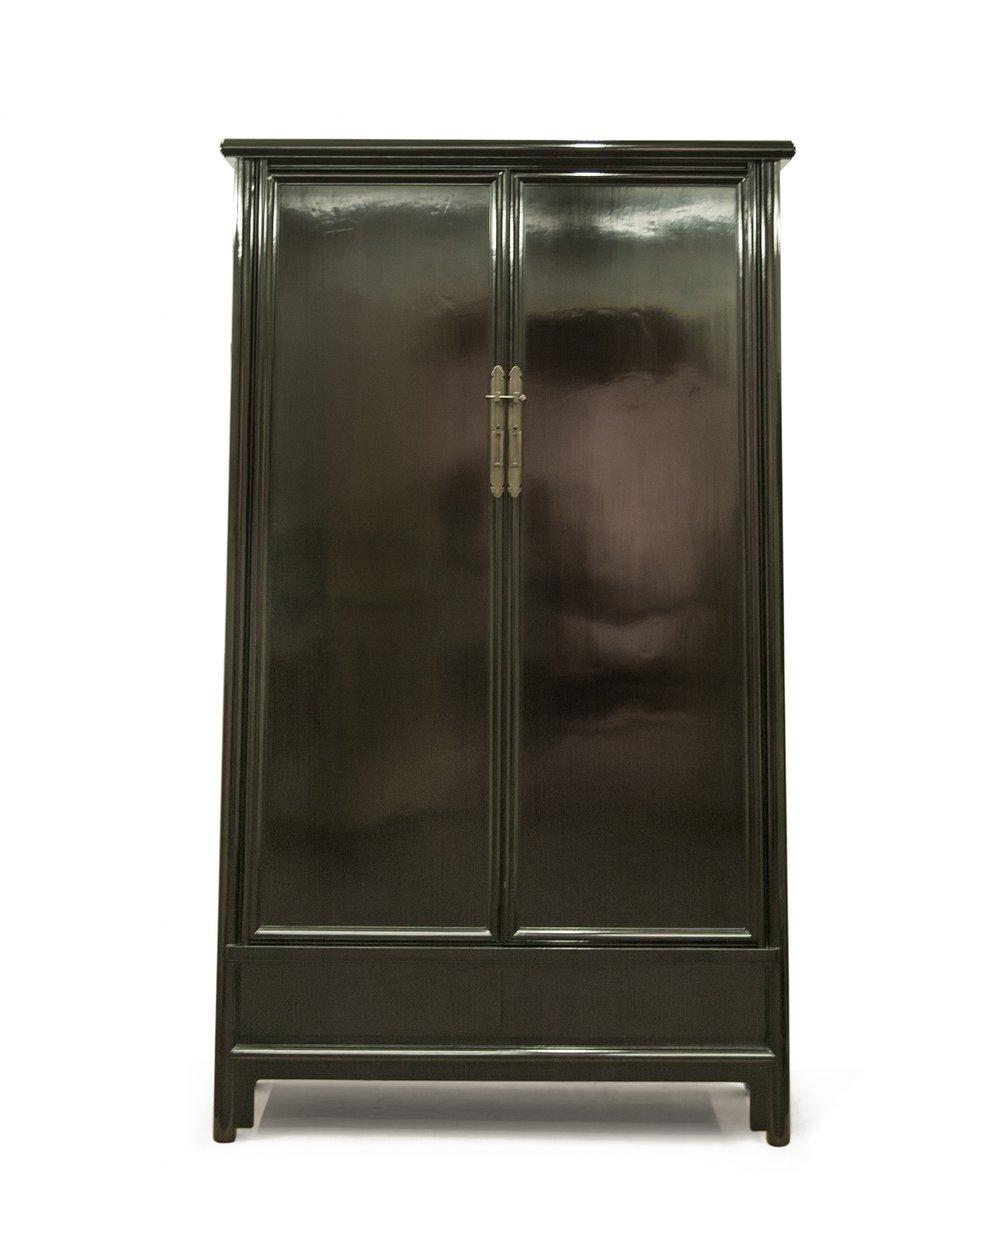 ....Bespoke Ming Style Chinese furniture : TV cabinet..特别定制明式中式家具:电视柜....